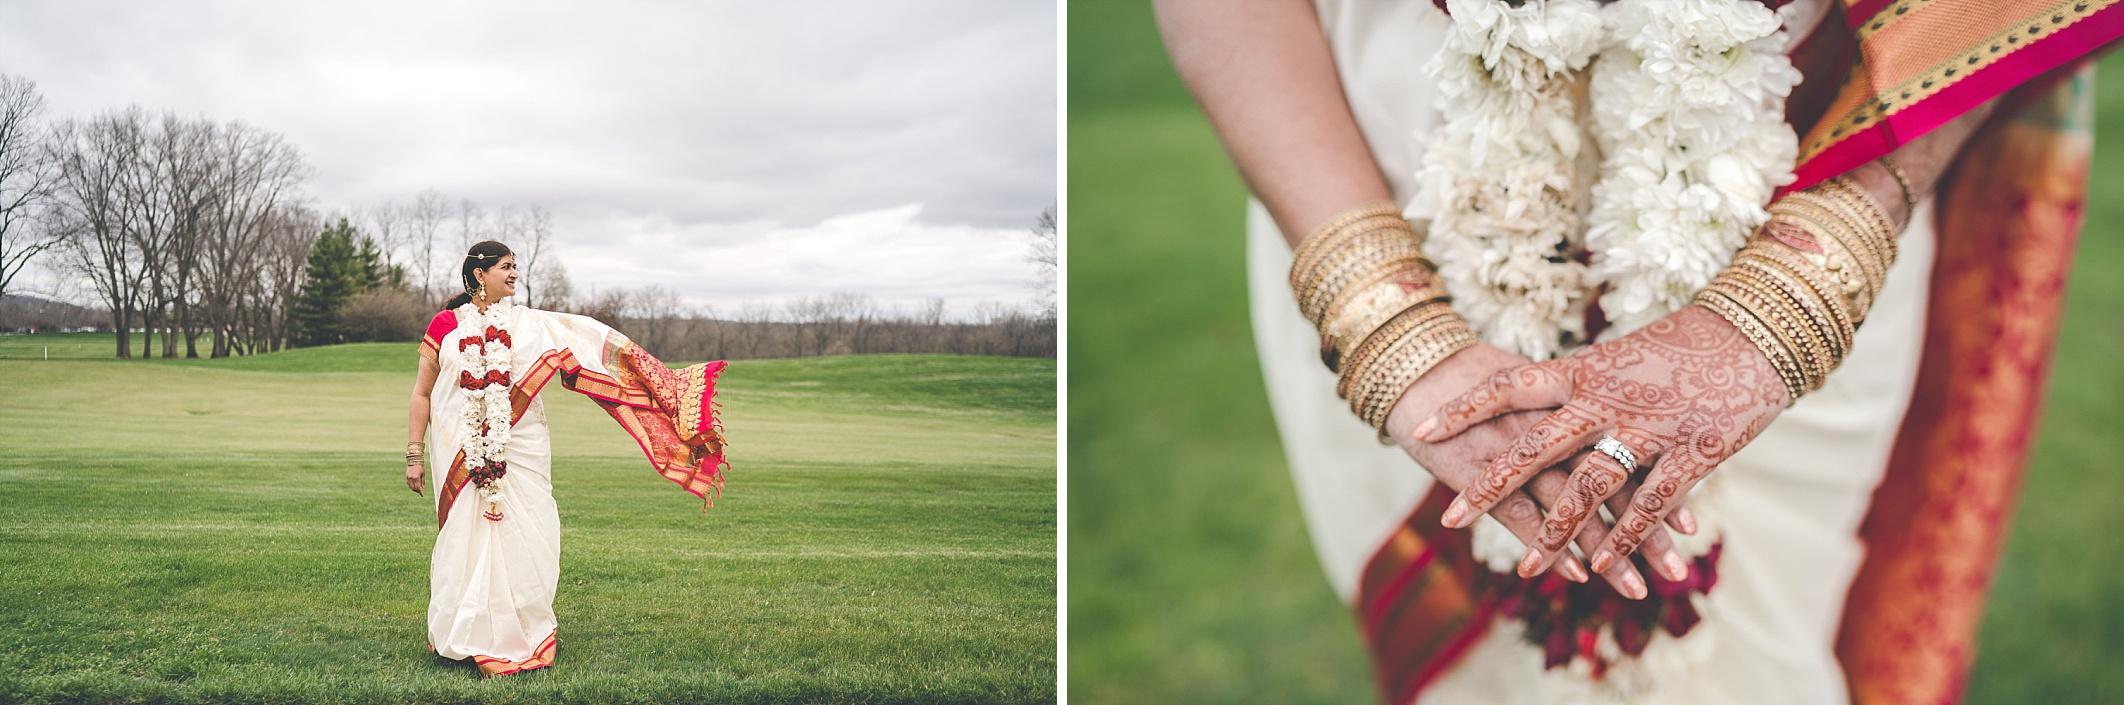 2693_dayton-indian-wedding-photographer-beavercreek_0049.jpg